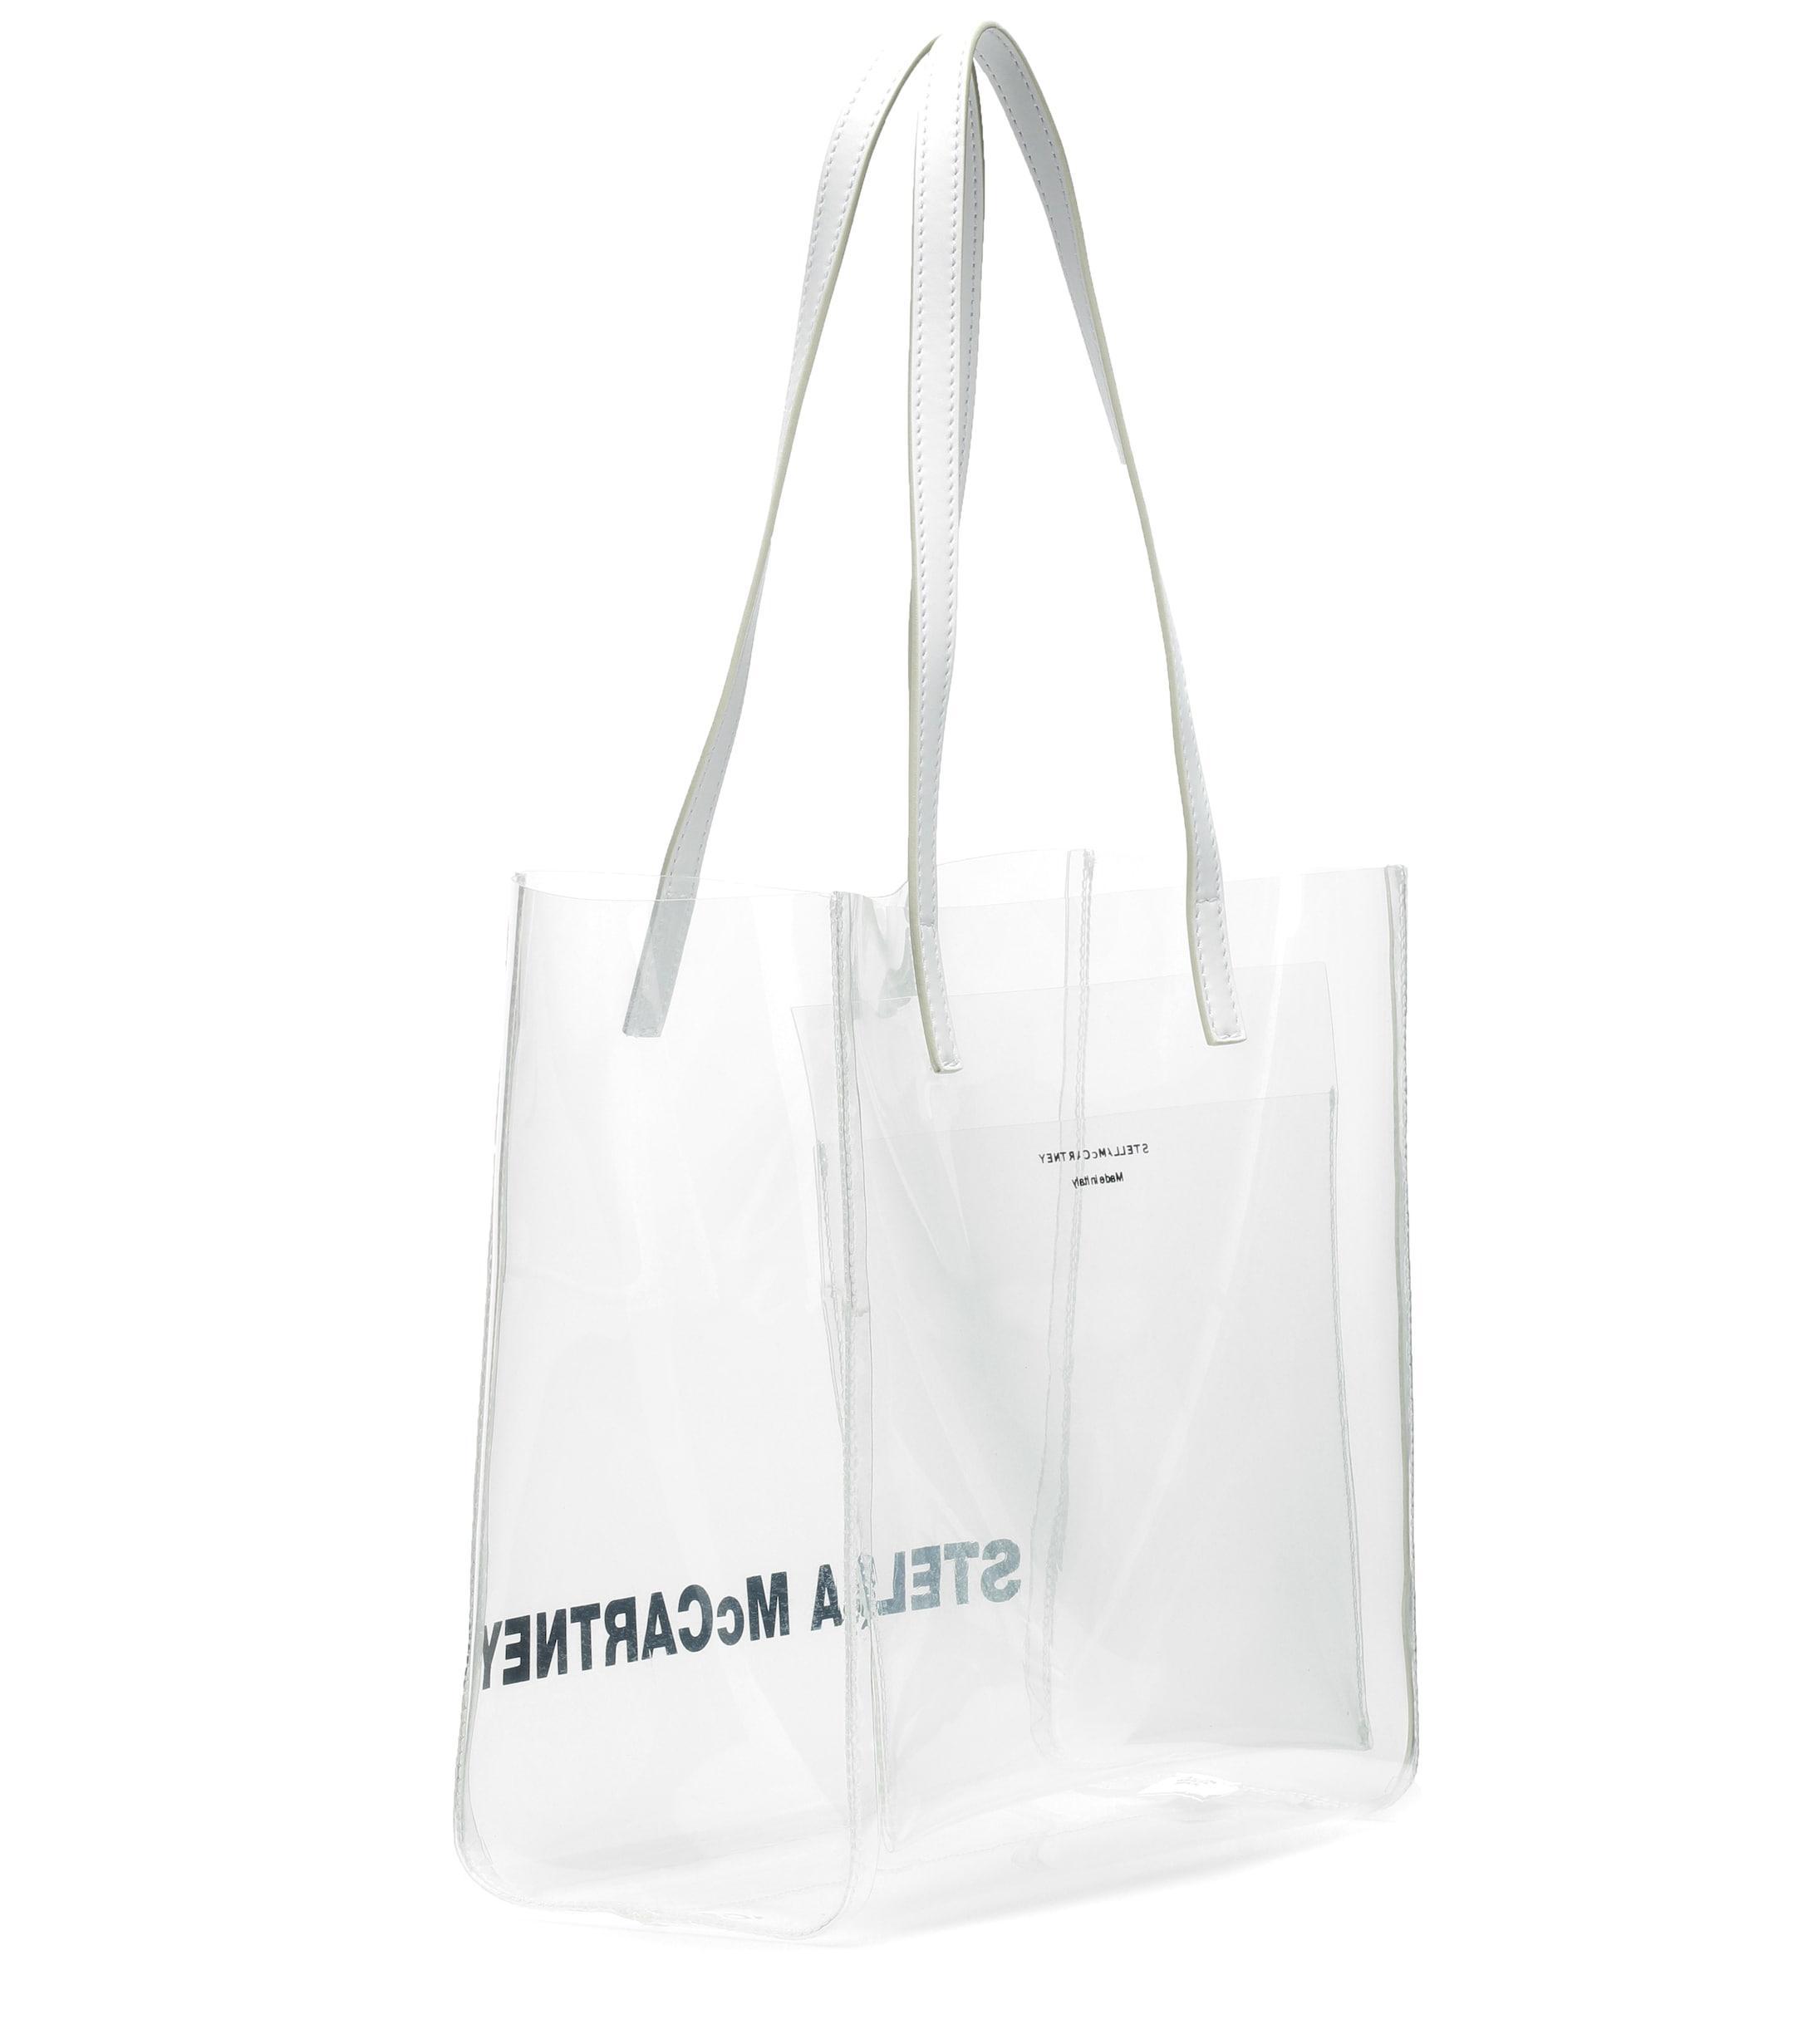 Lyst - Stella Mccartney Logo Medium Pvc Shopper in White 697ac0eb0dc62